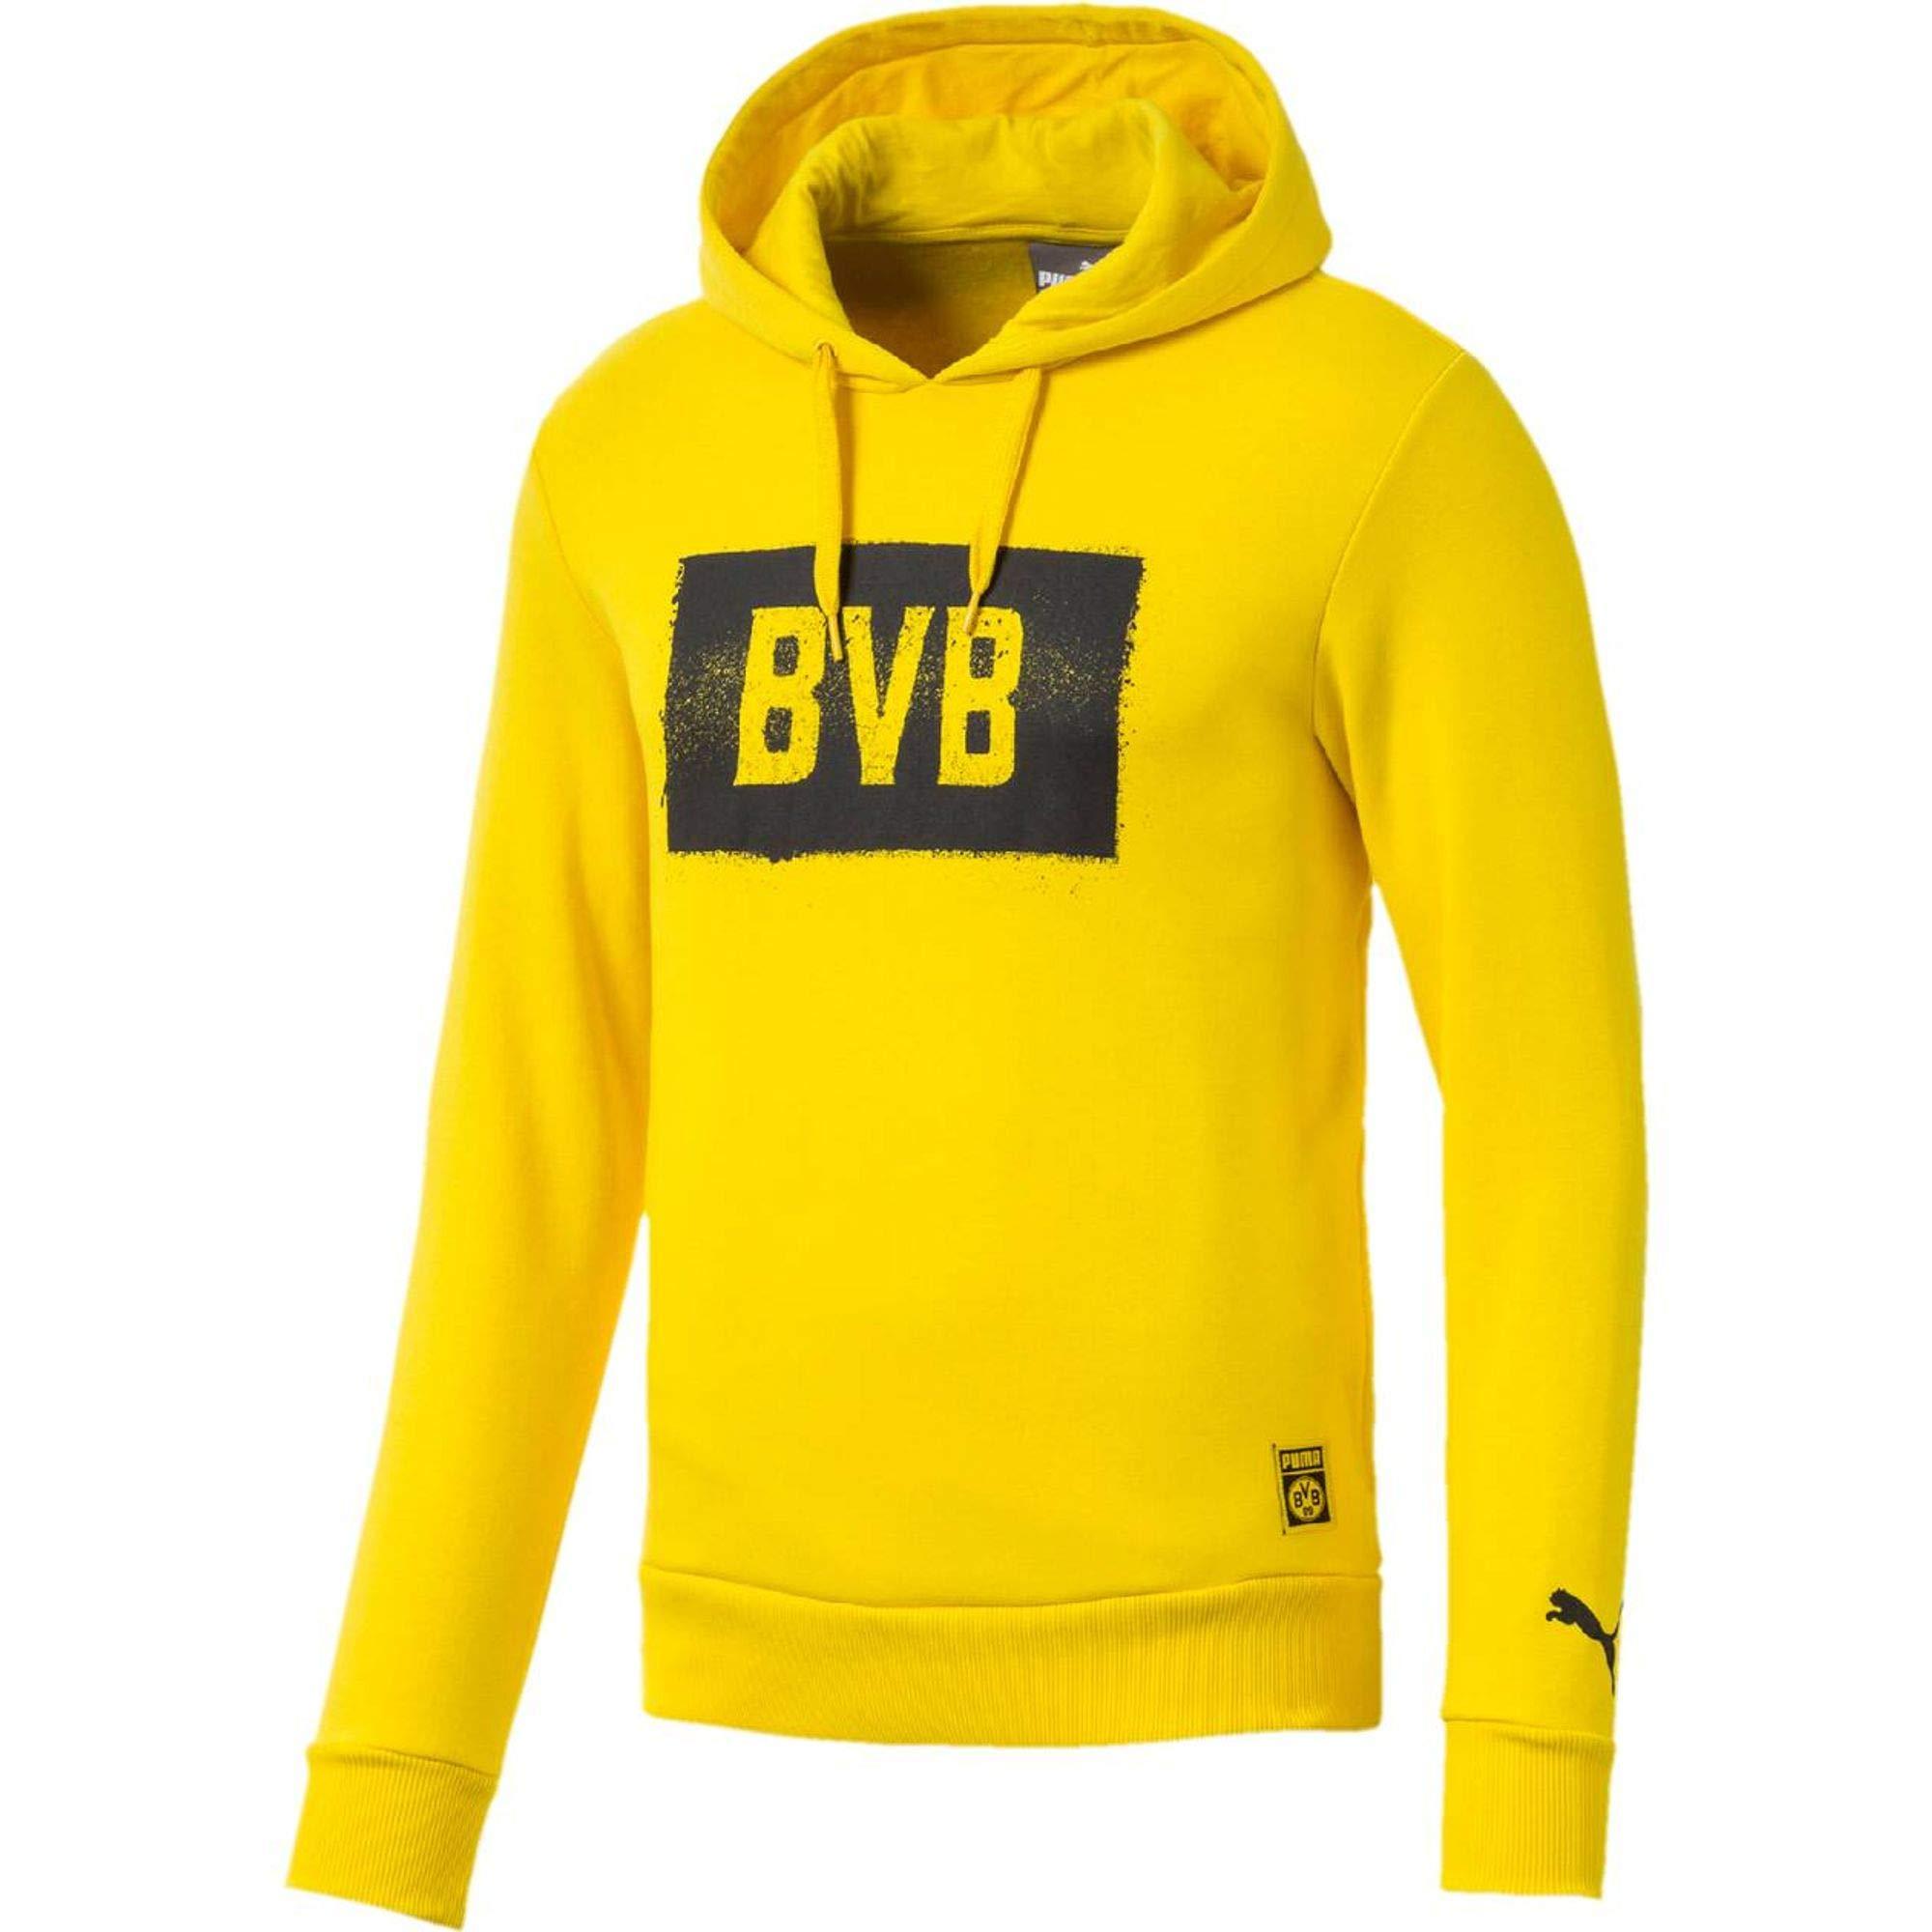 Amazon.it: Borussia Dortmund: Felpe